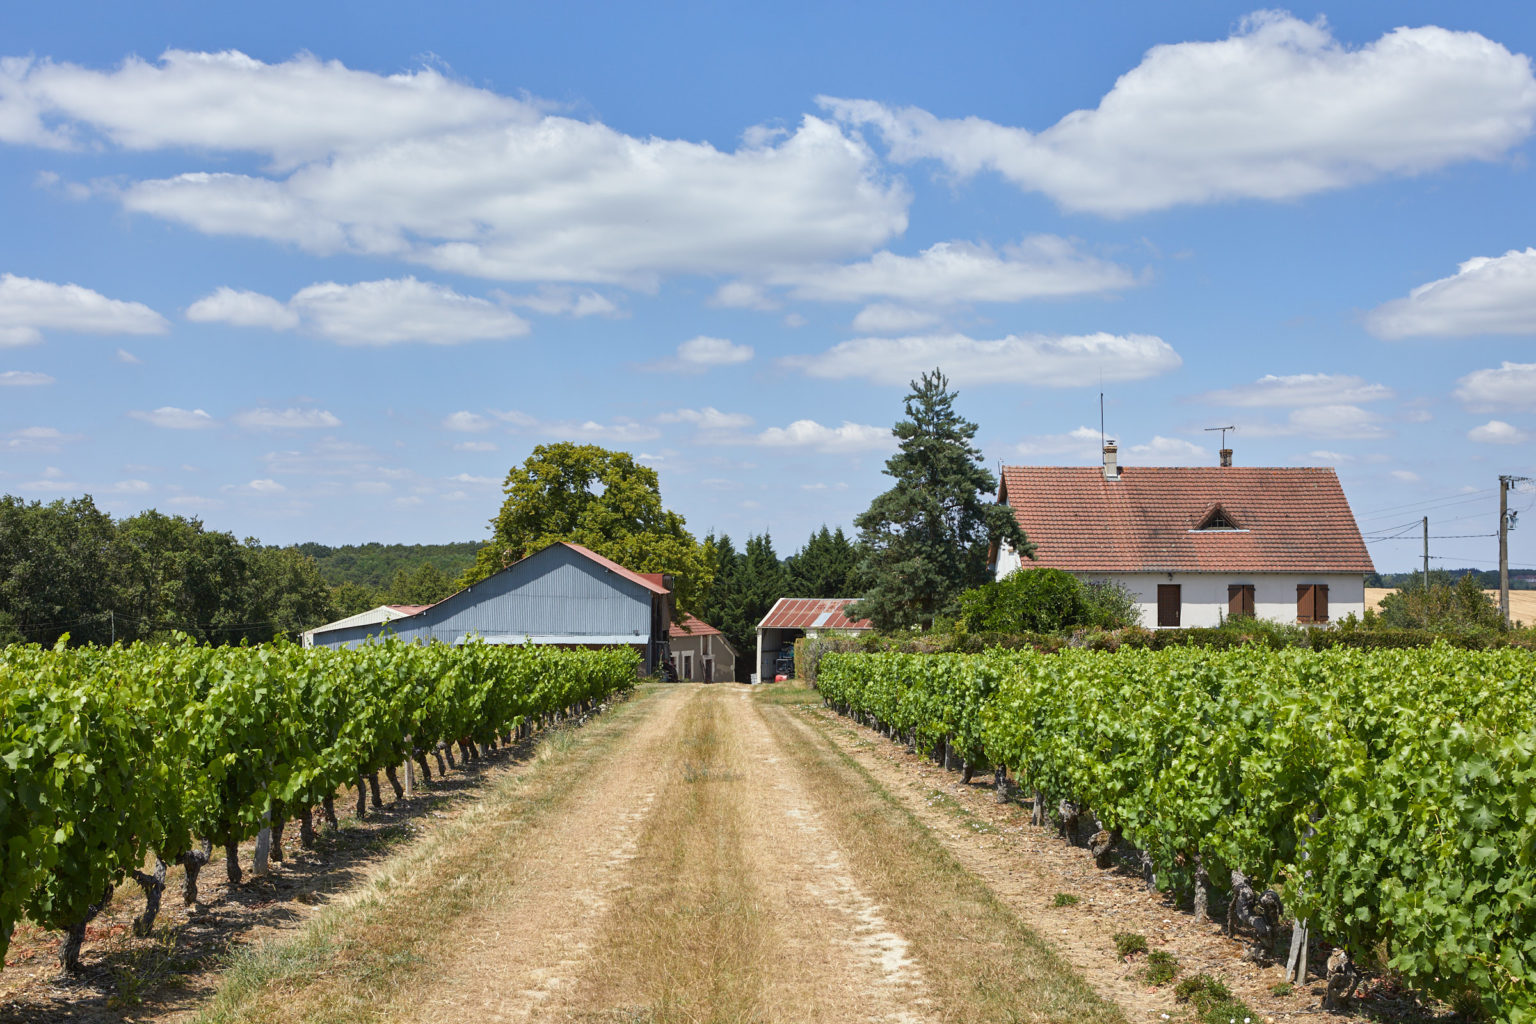 Domaine viticole Touraine ref 202